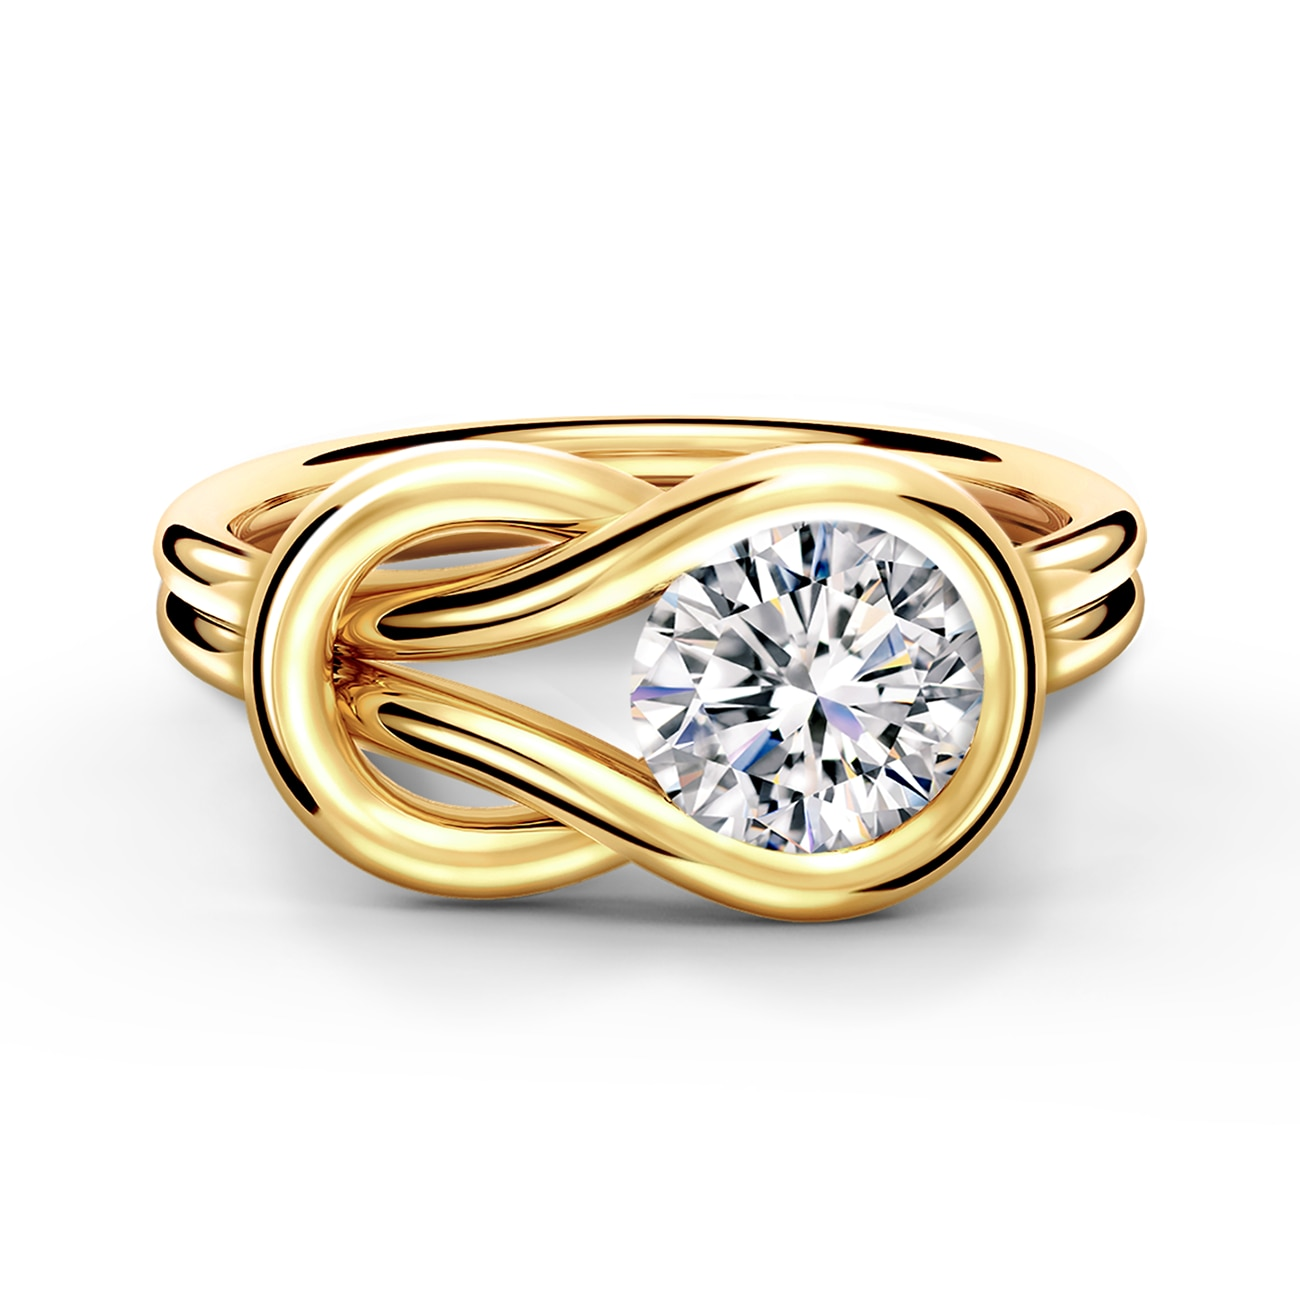 Encordia 174 Solitaire Ring Forevermark